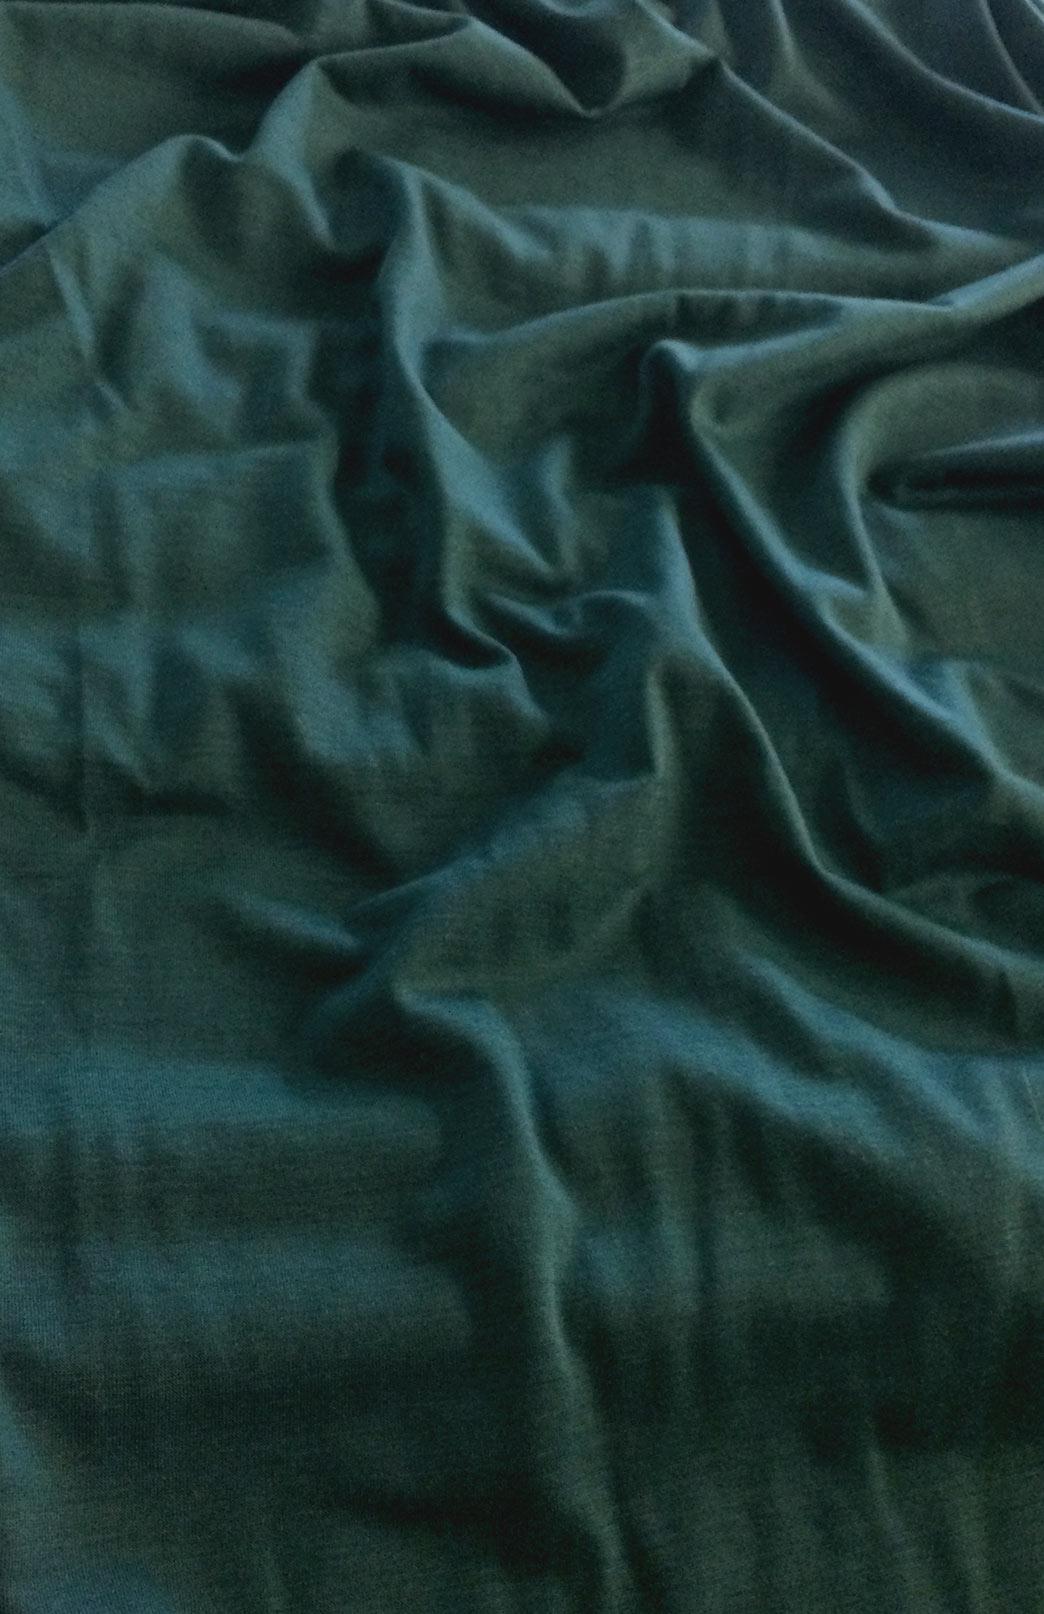 Short Sleeved Crew Neck Top - Lightweight (~170g) - Men's Pure Merino Wool Lightweight Short Sleeved Thermal Top with Crew Neckline - Smitten Merino Tasmania Australia